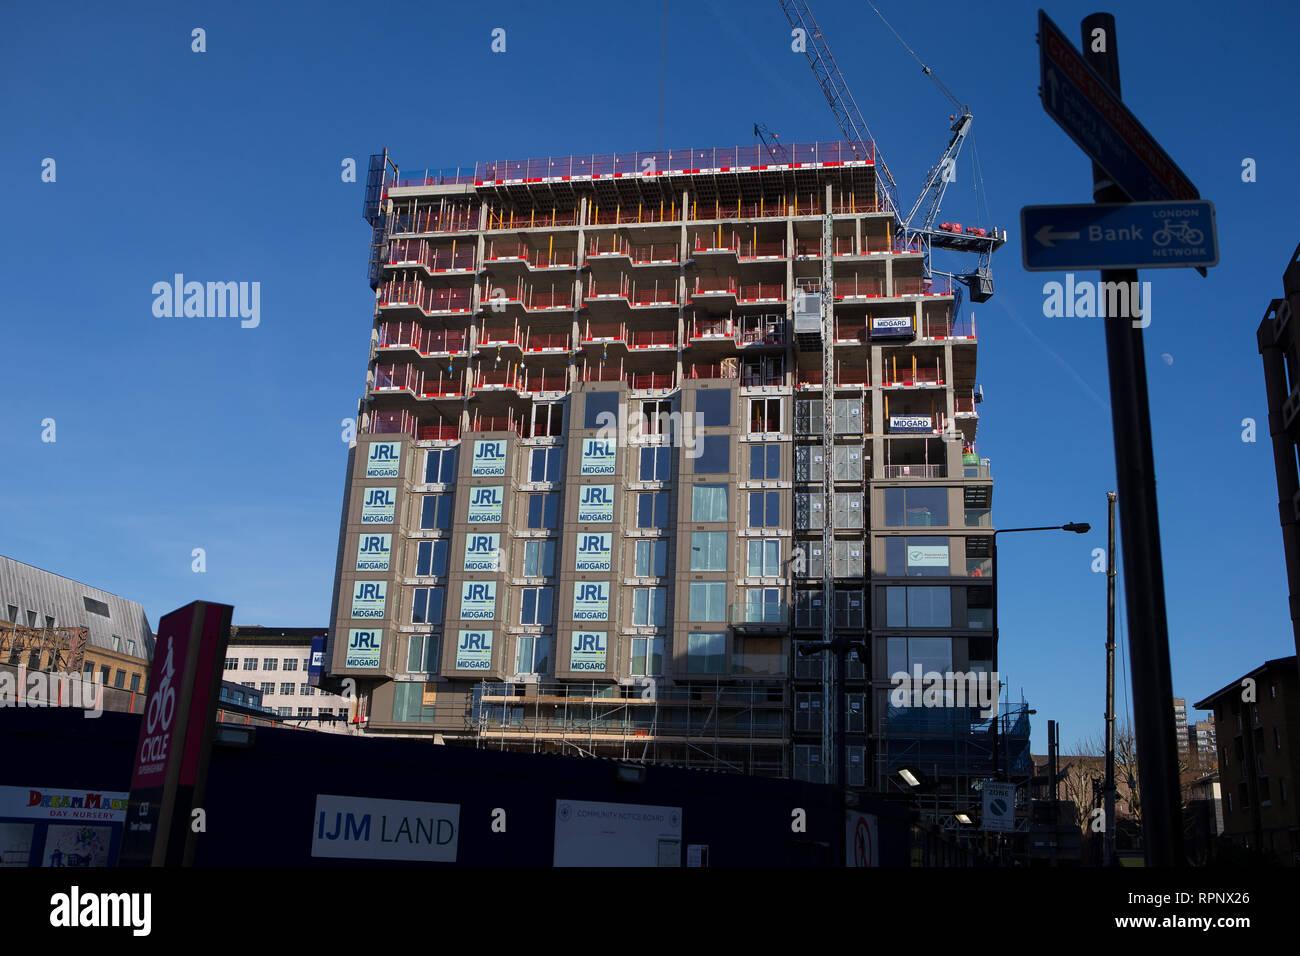 Royal Mint Gardens, Royal Mint Street residential building development works, East London, E1 - Stock Image